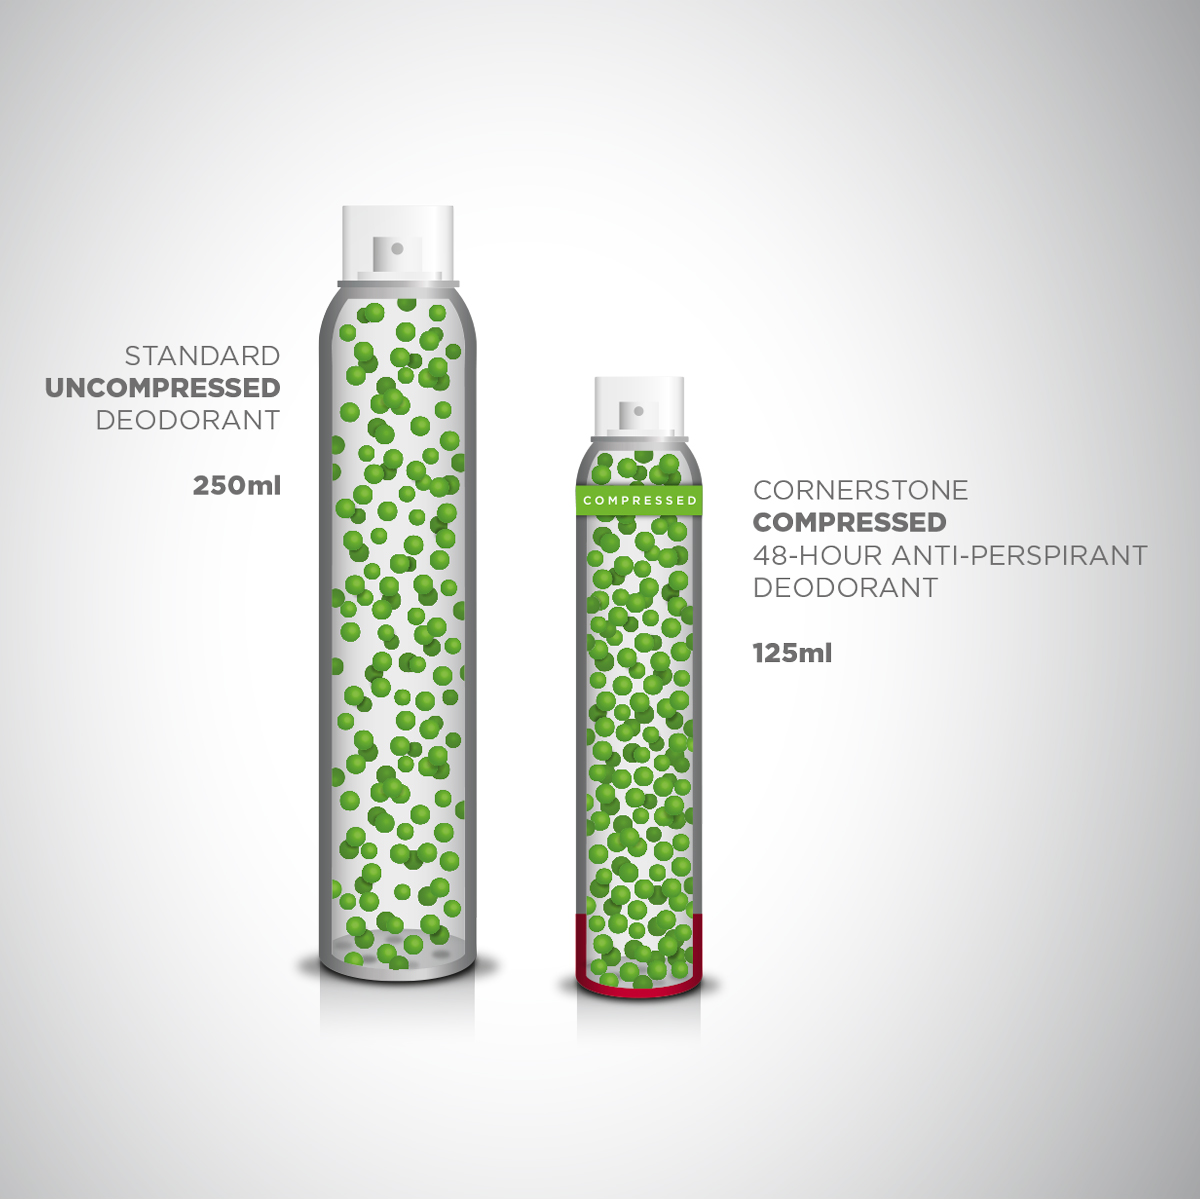 The Science Behind Compressed Anti-Perspirant Deodorant